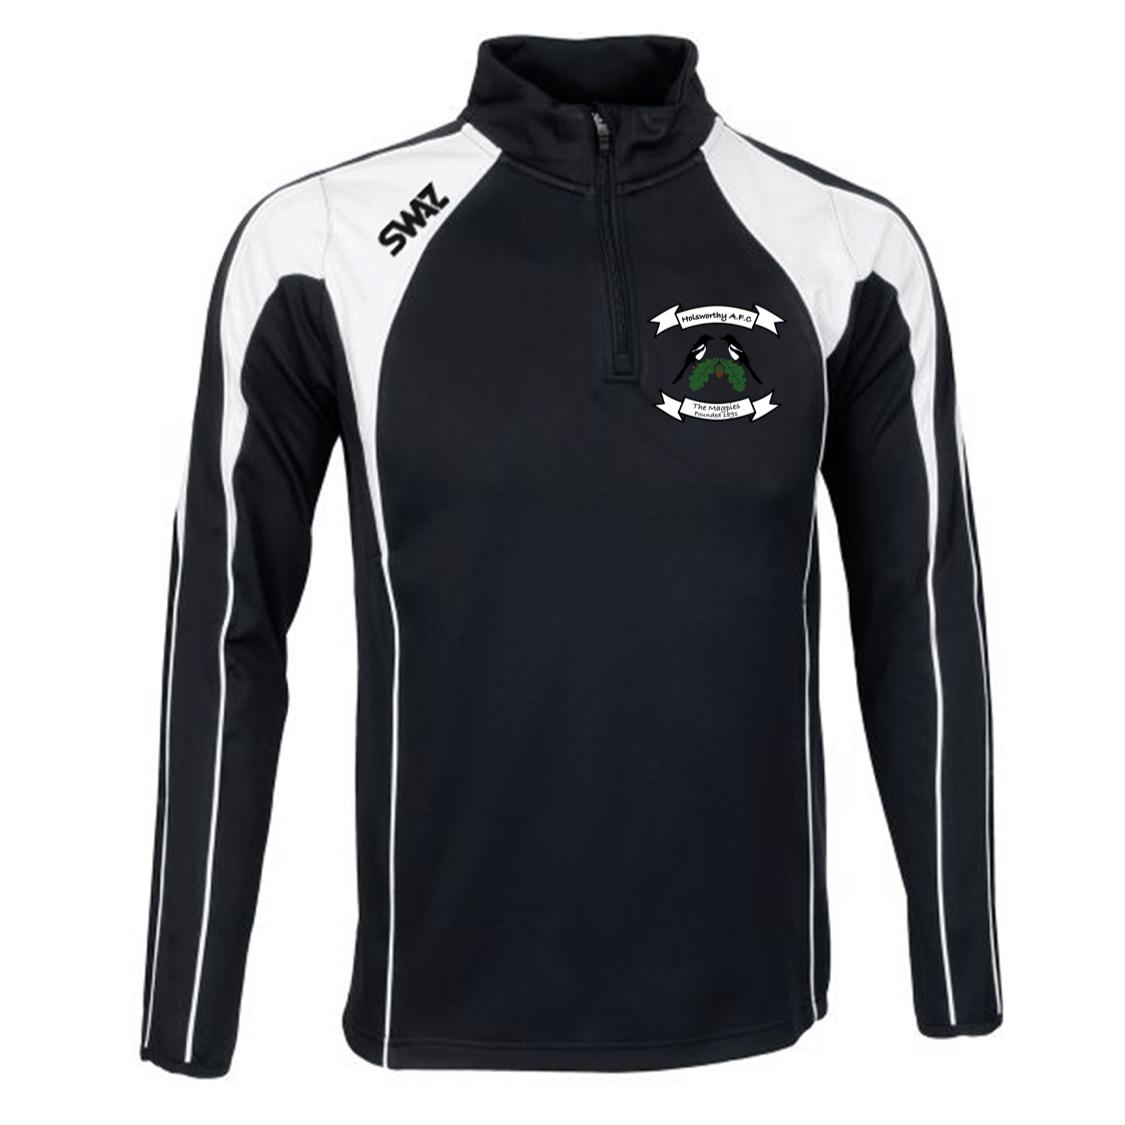 Holsworthy Premier Midlayer | SWAZ Teamwear | Current Fashionable